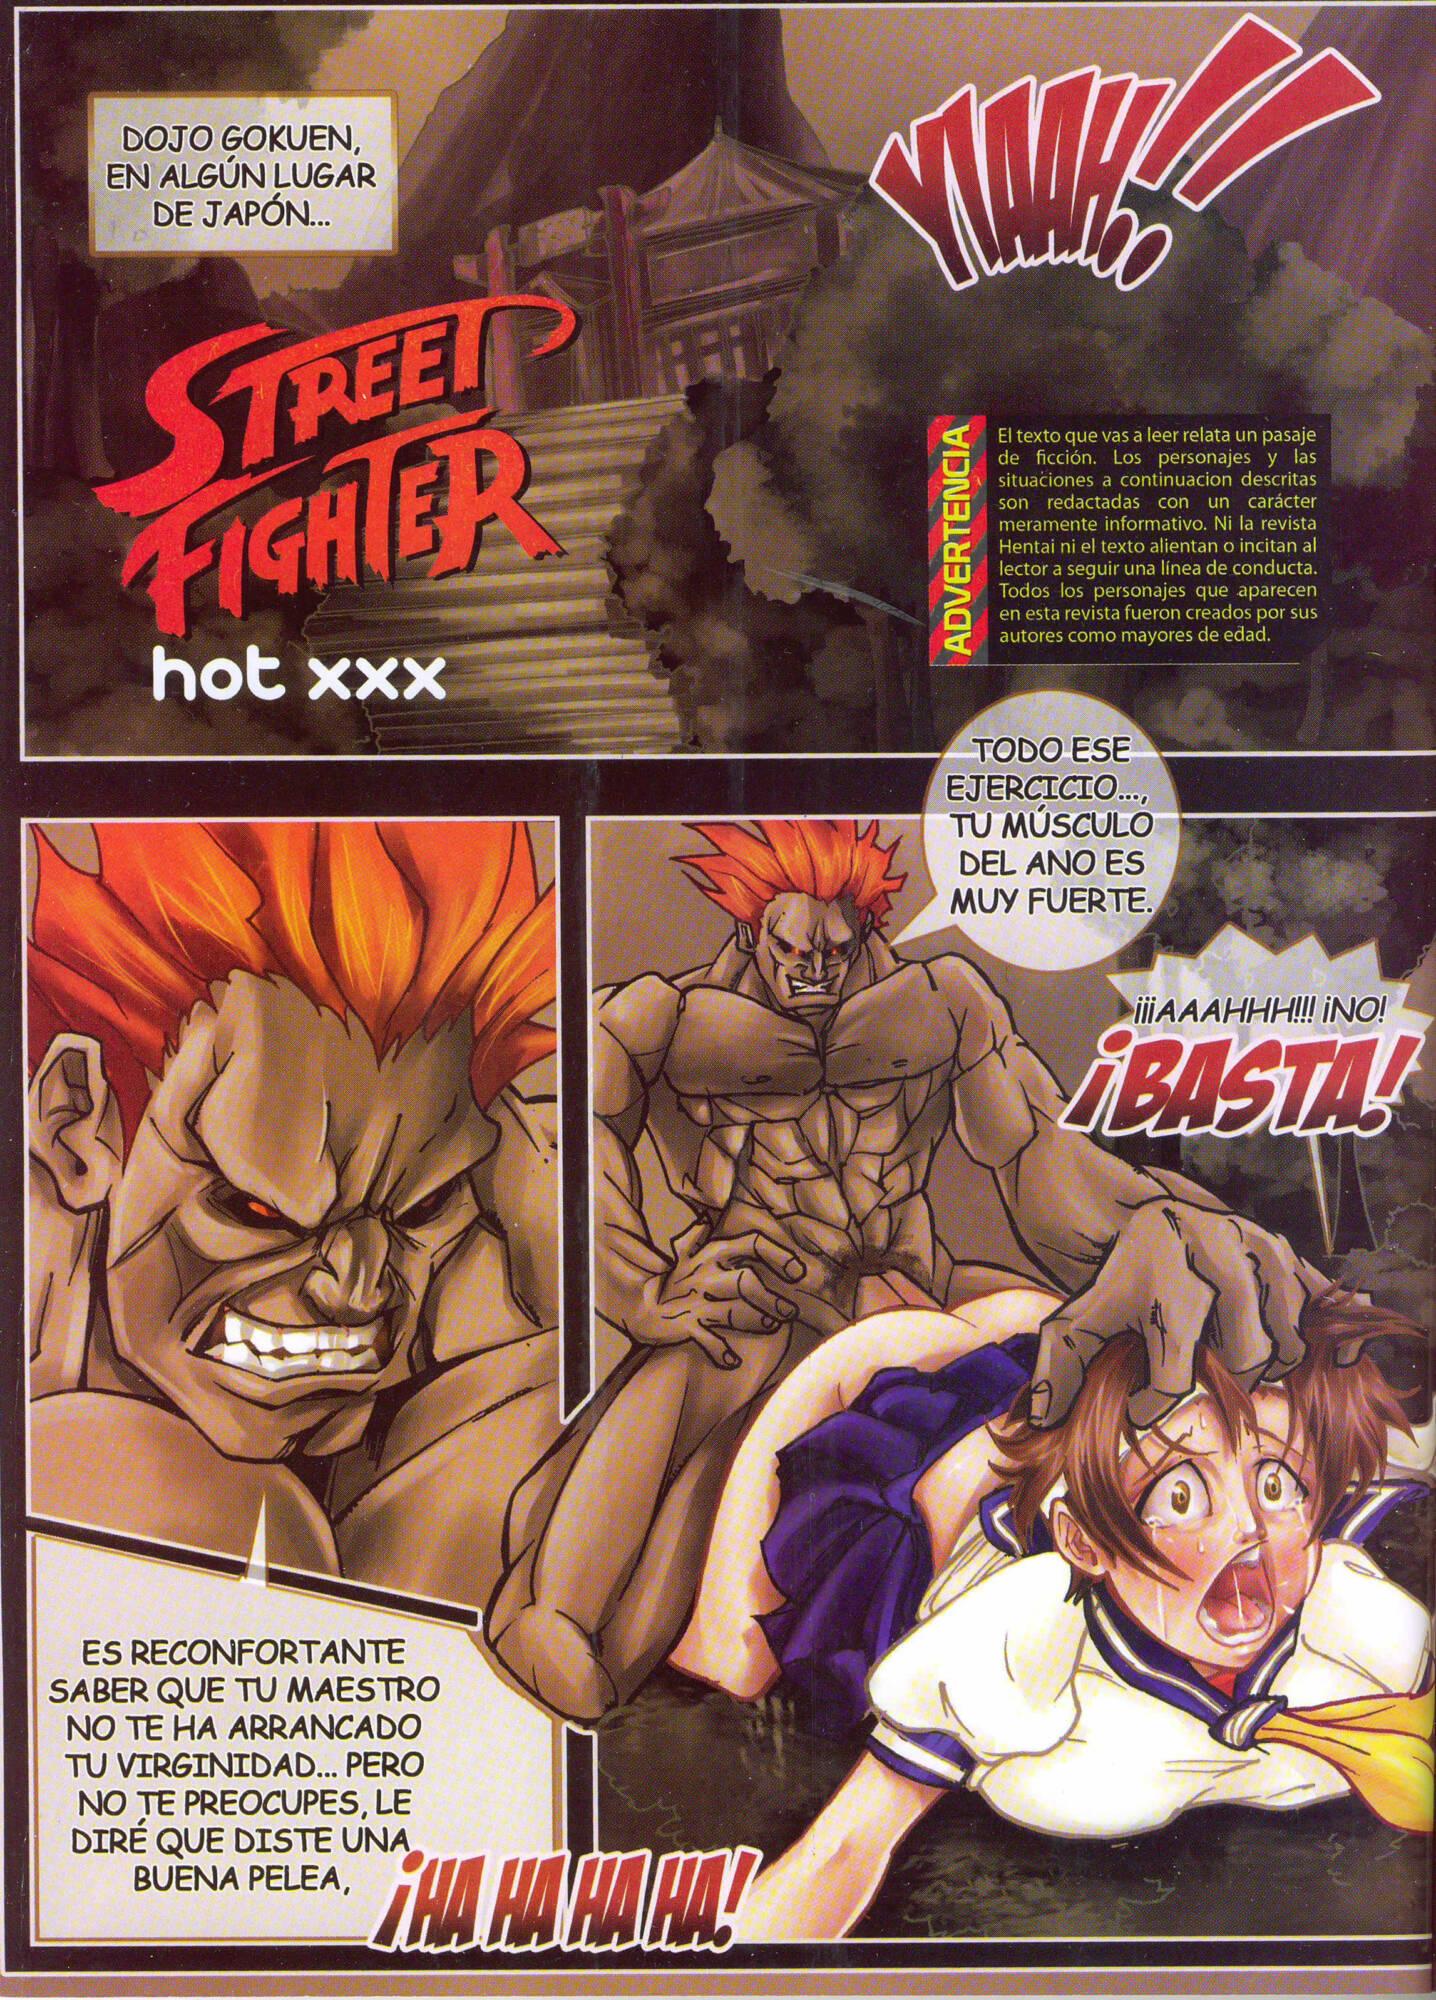 Street Fighter Hot XXX (Spanish) - page01 Capcom,Street Fighter,Tekken,  xxx porn rule34